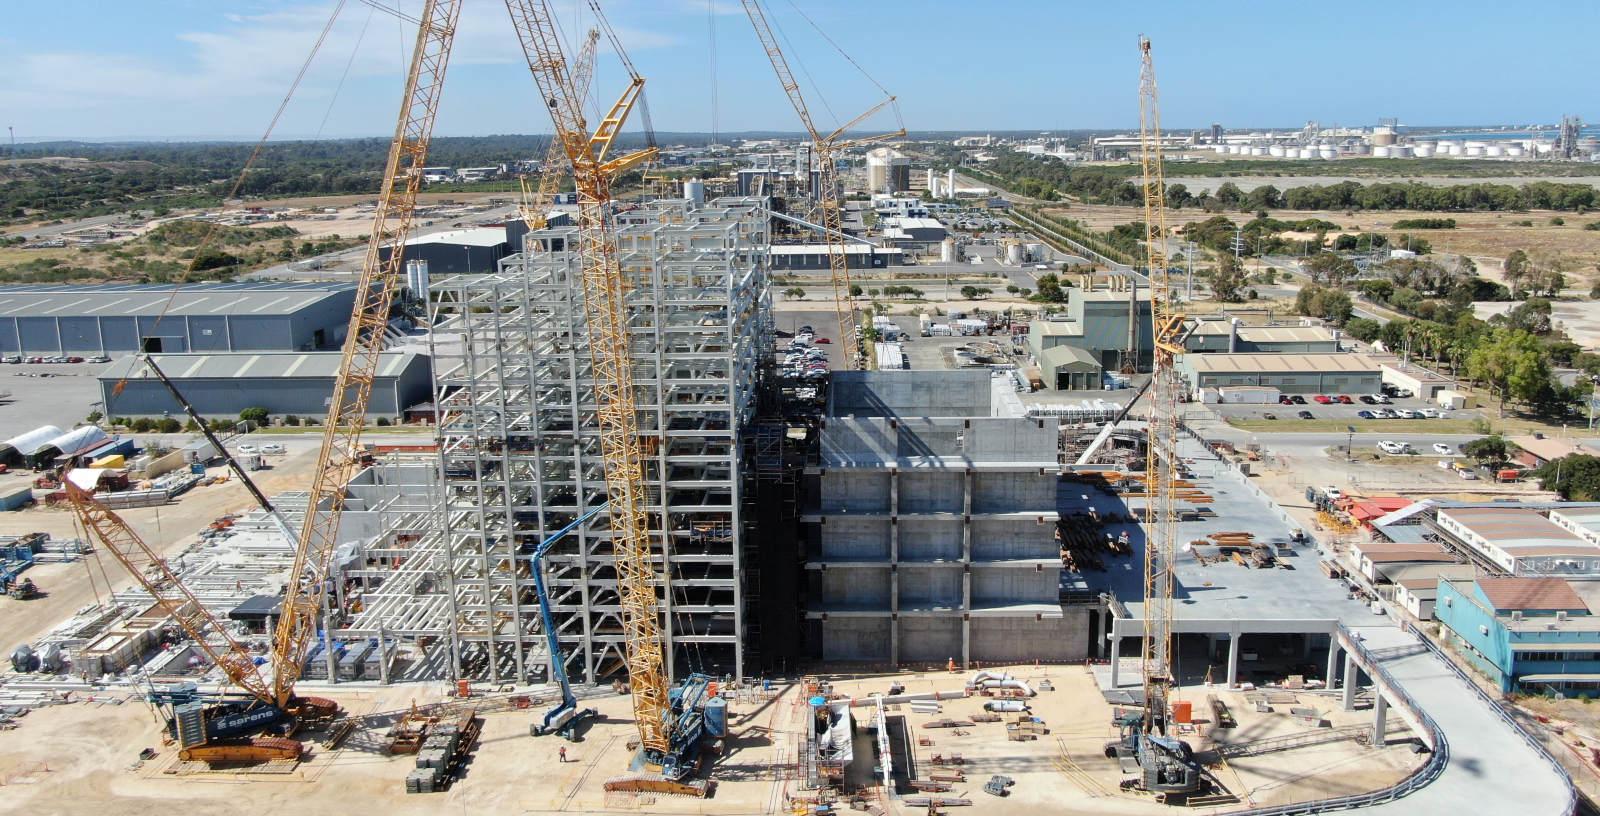 Kwinana_Waste_To_Energy_Plant_Australia_Acciona_IDOM_17